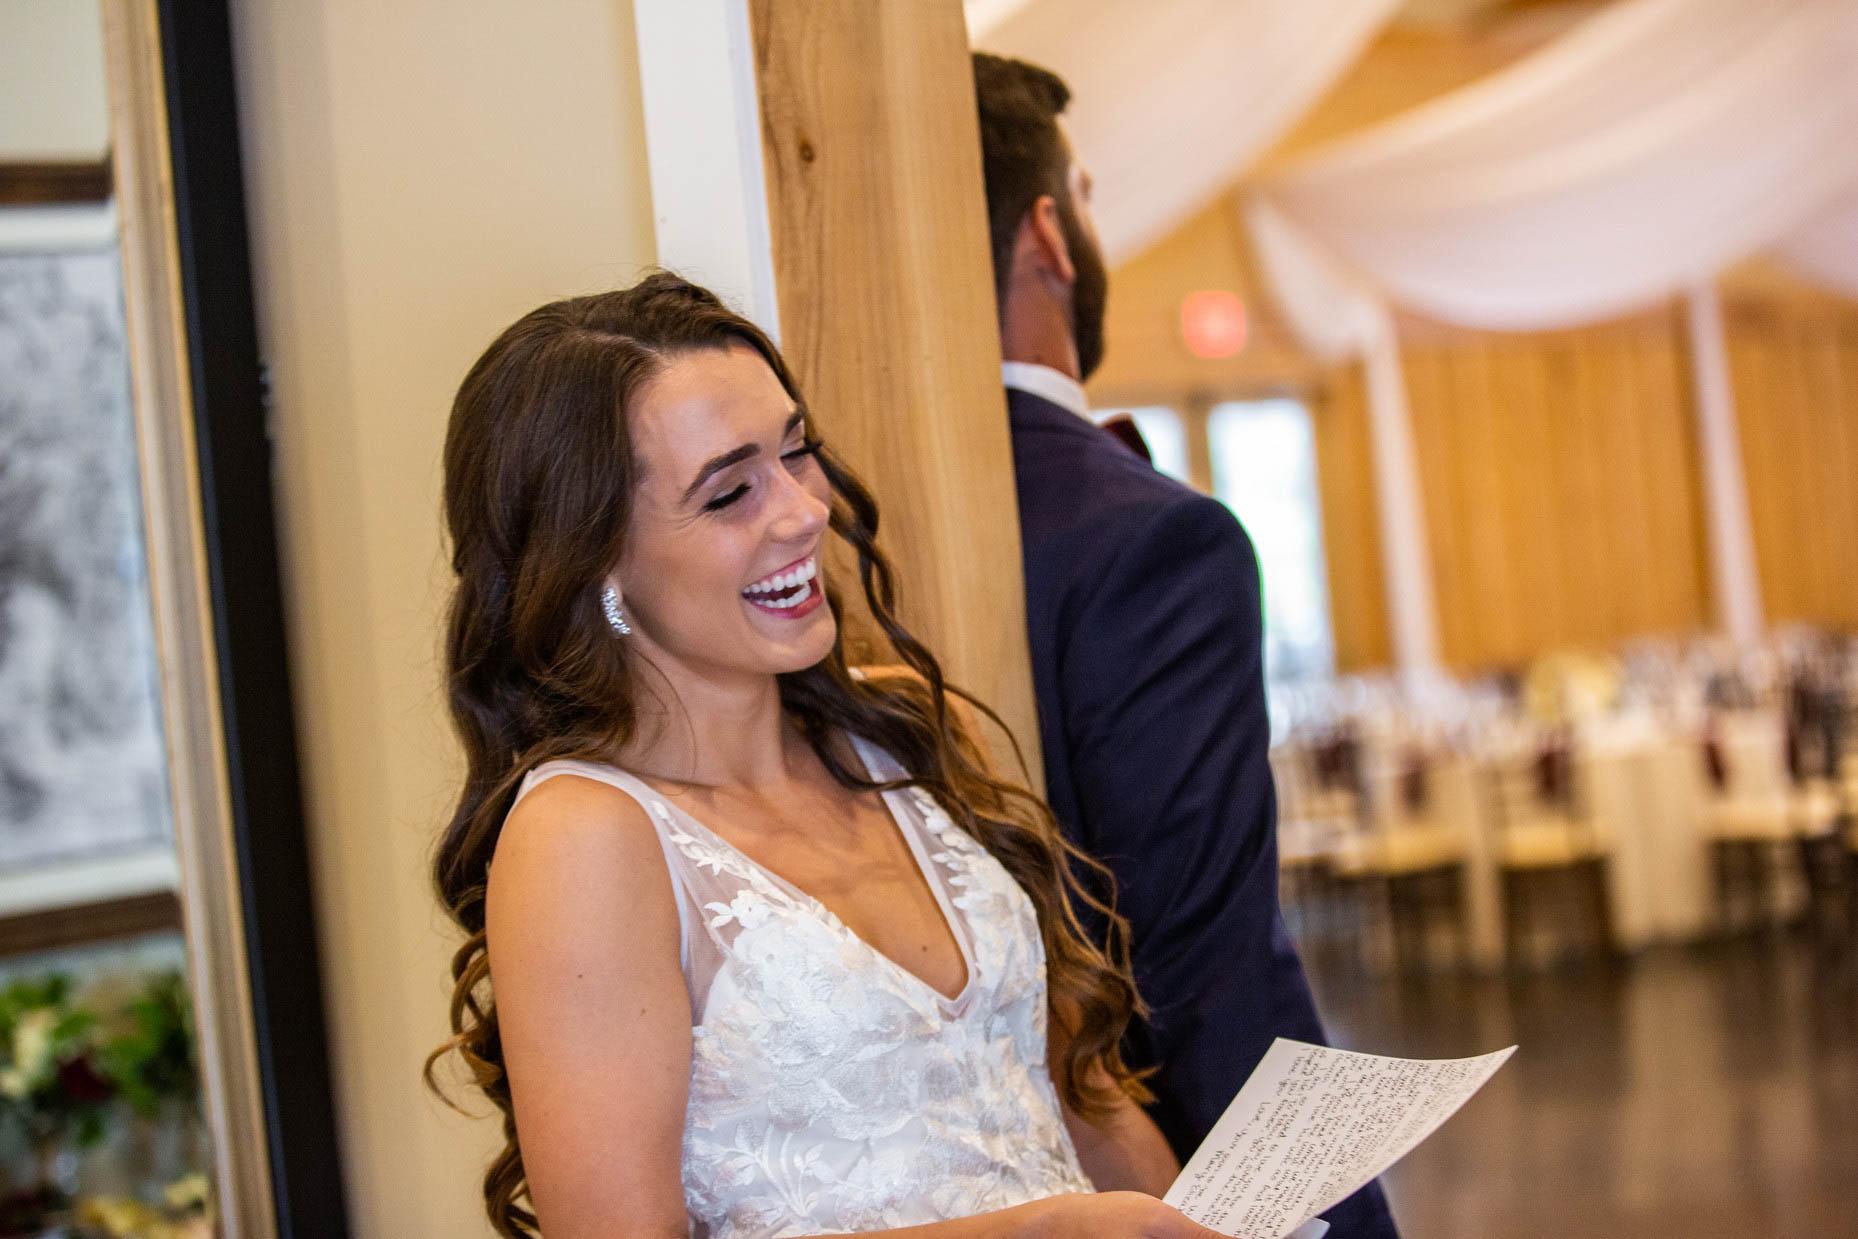 adam-szarmack-bowing-oaks-wedding-photographer-jacksonville-69.jpg